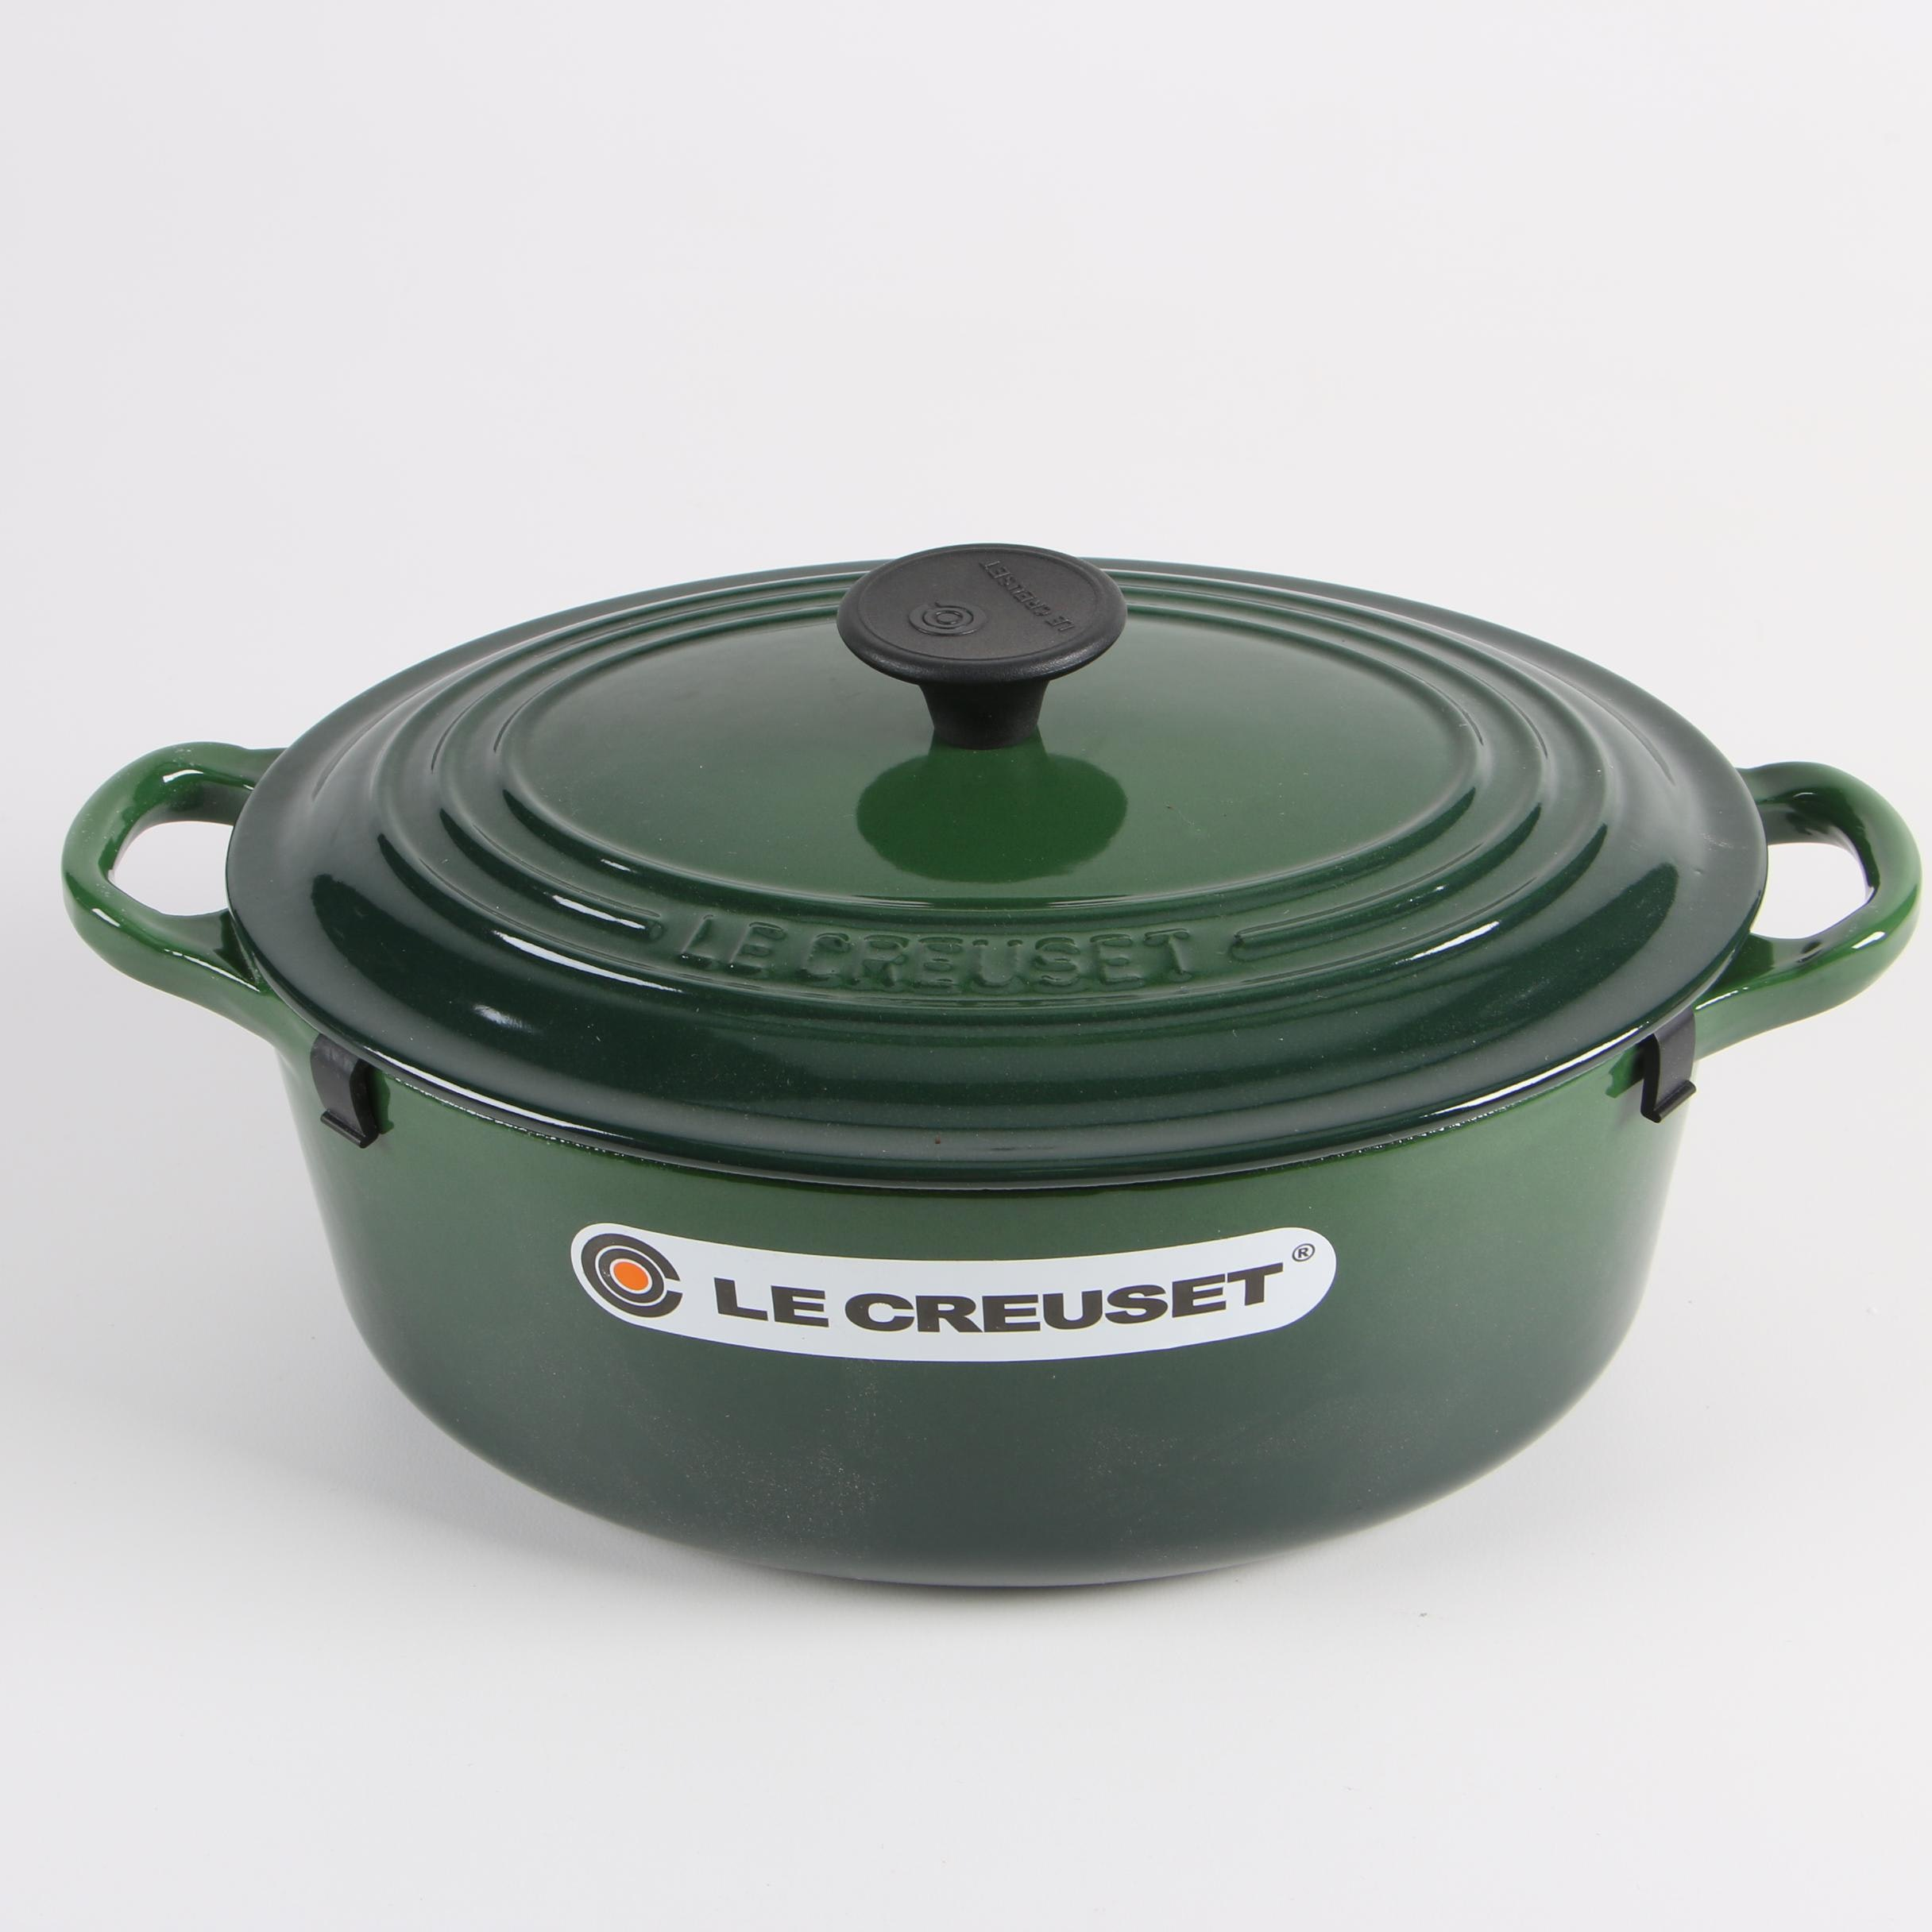 Le Creuset Dark Green Enameled Cast Iron Casserole Dish